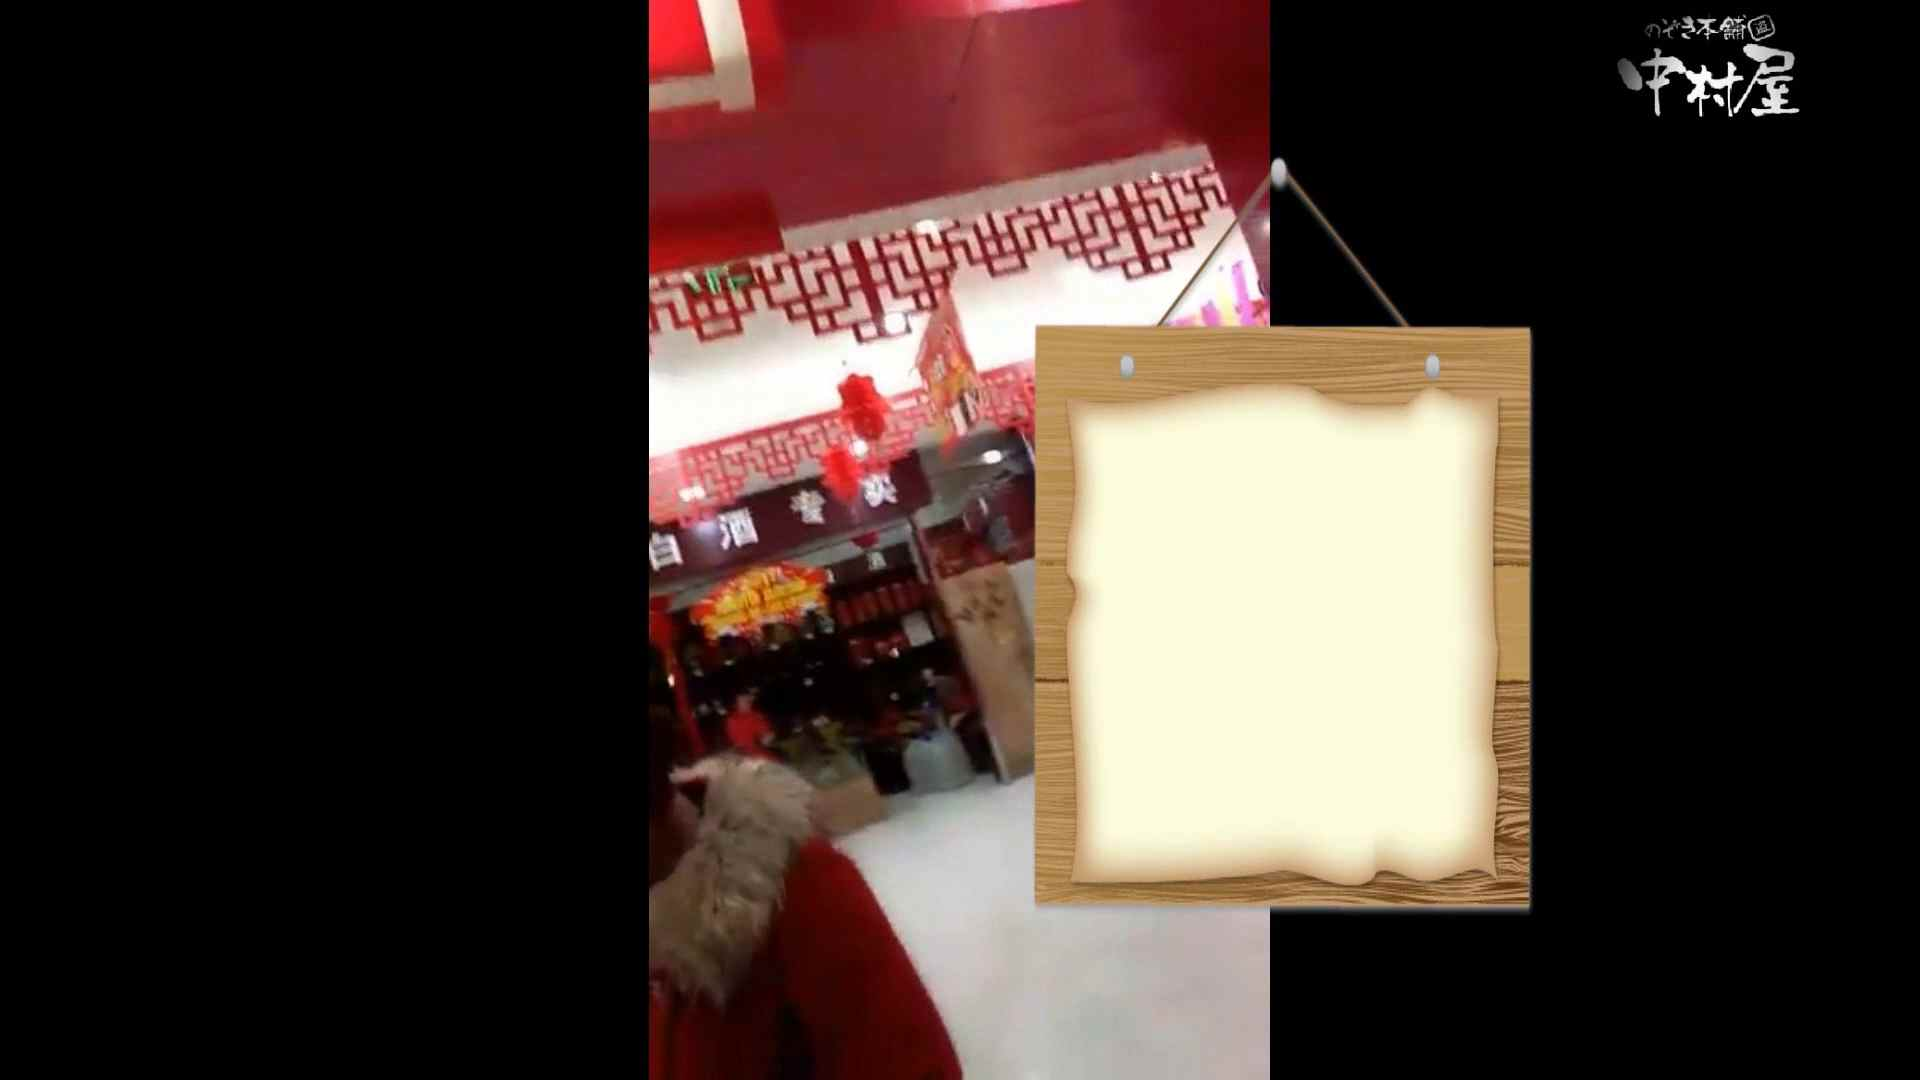 GOD HAND 芸術大学盗撮‼vol.104 OLエロ画像 盗み撮り動画キャプチャ 60PICs 22